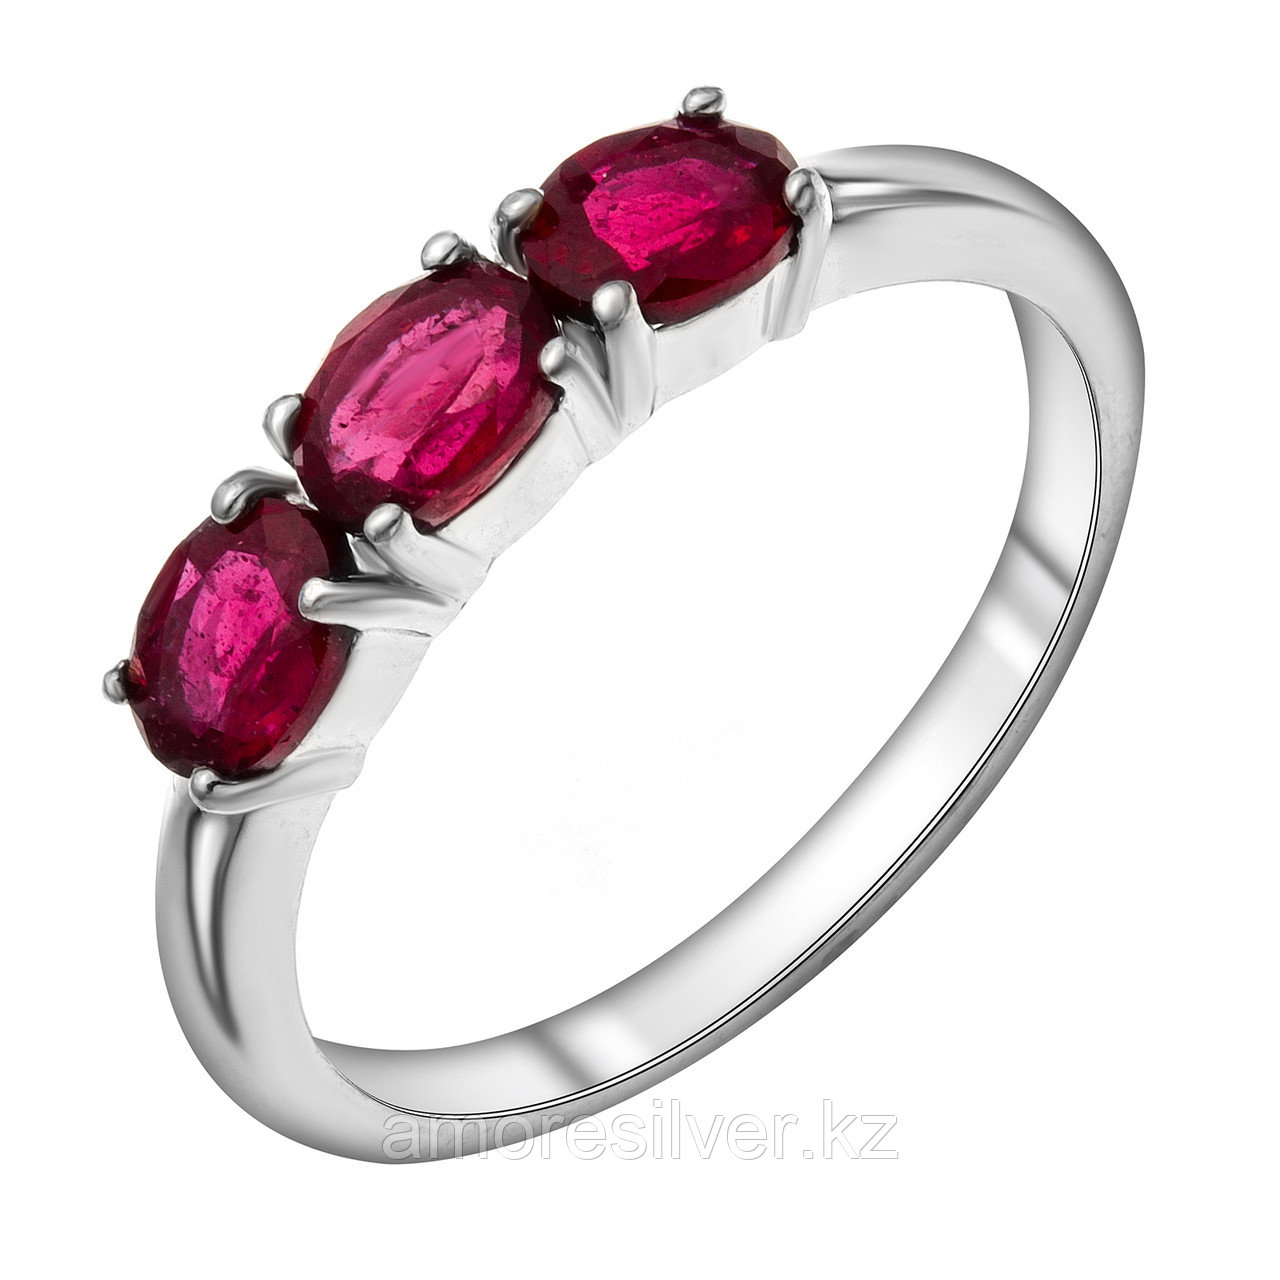 Серебряное кольцо с рубином   Teosa R-DRGR00940-RB размеры - 16 16,5 17,5